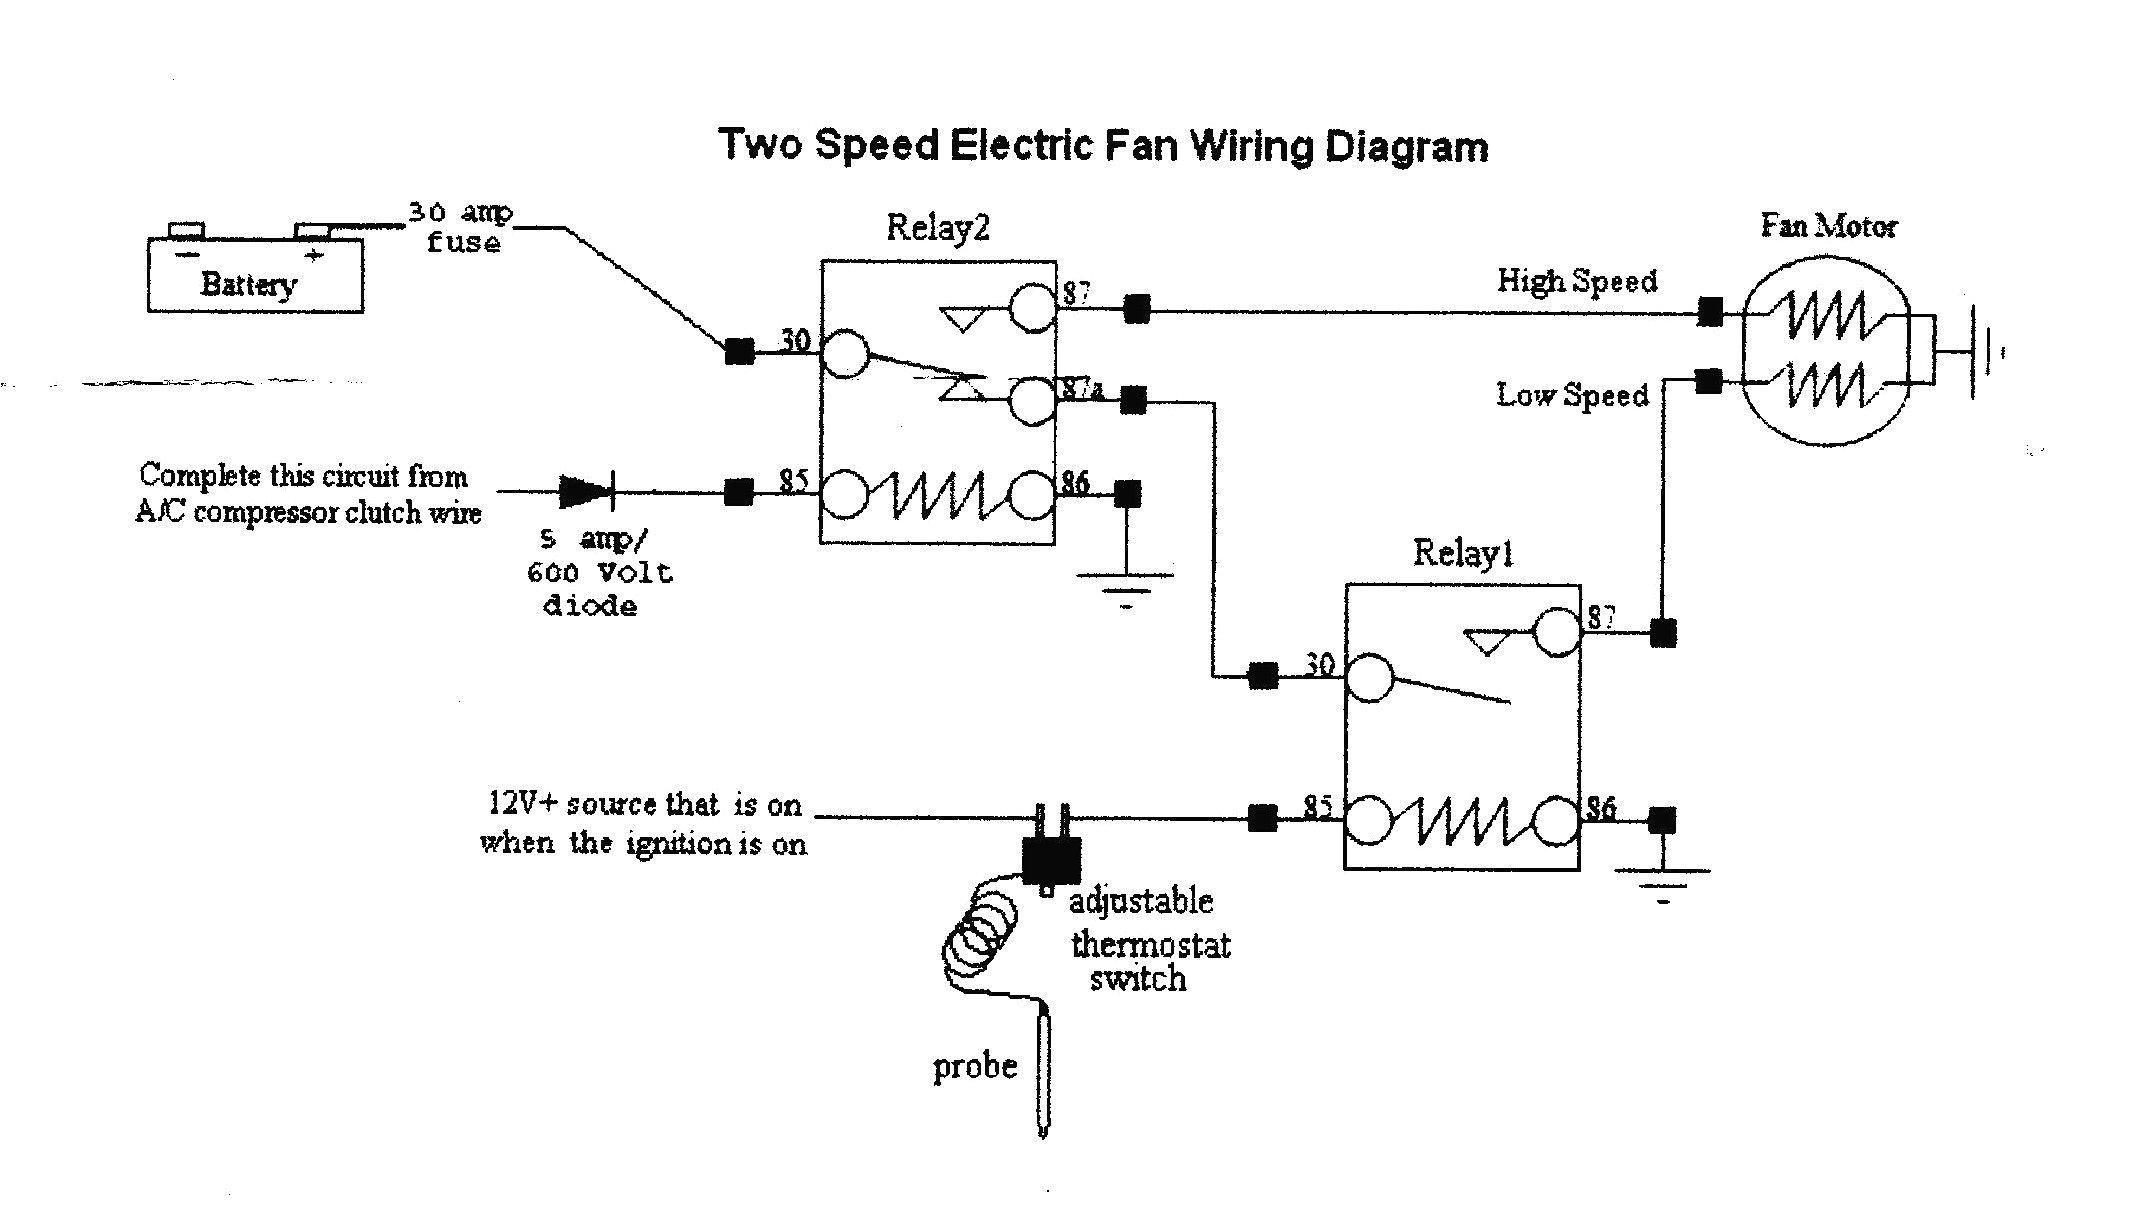 Ceiling Fan Wiring Circuit Diagram Unique Wiring Diagram for Electric Fan Relay Diagram